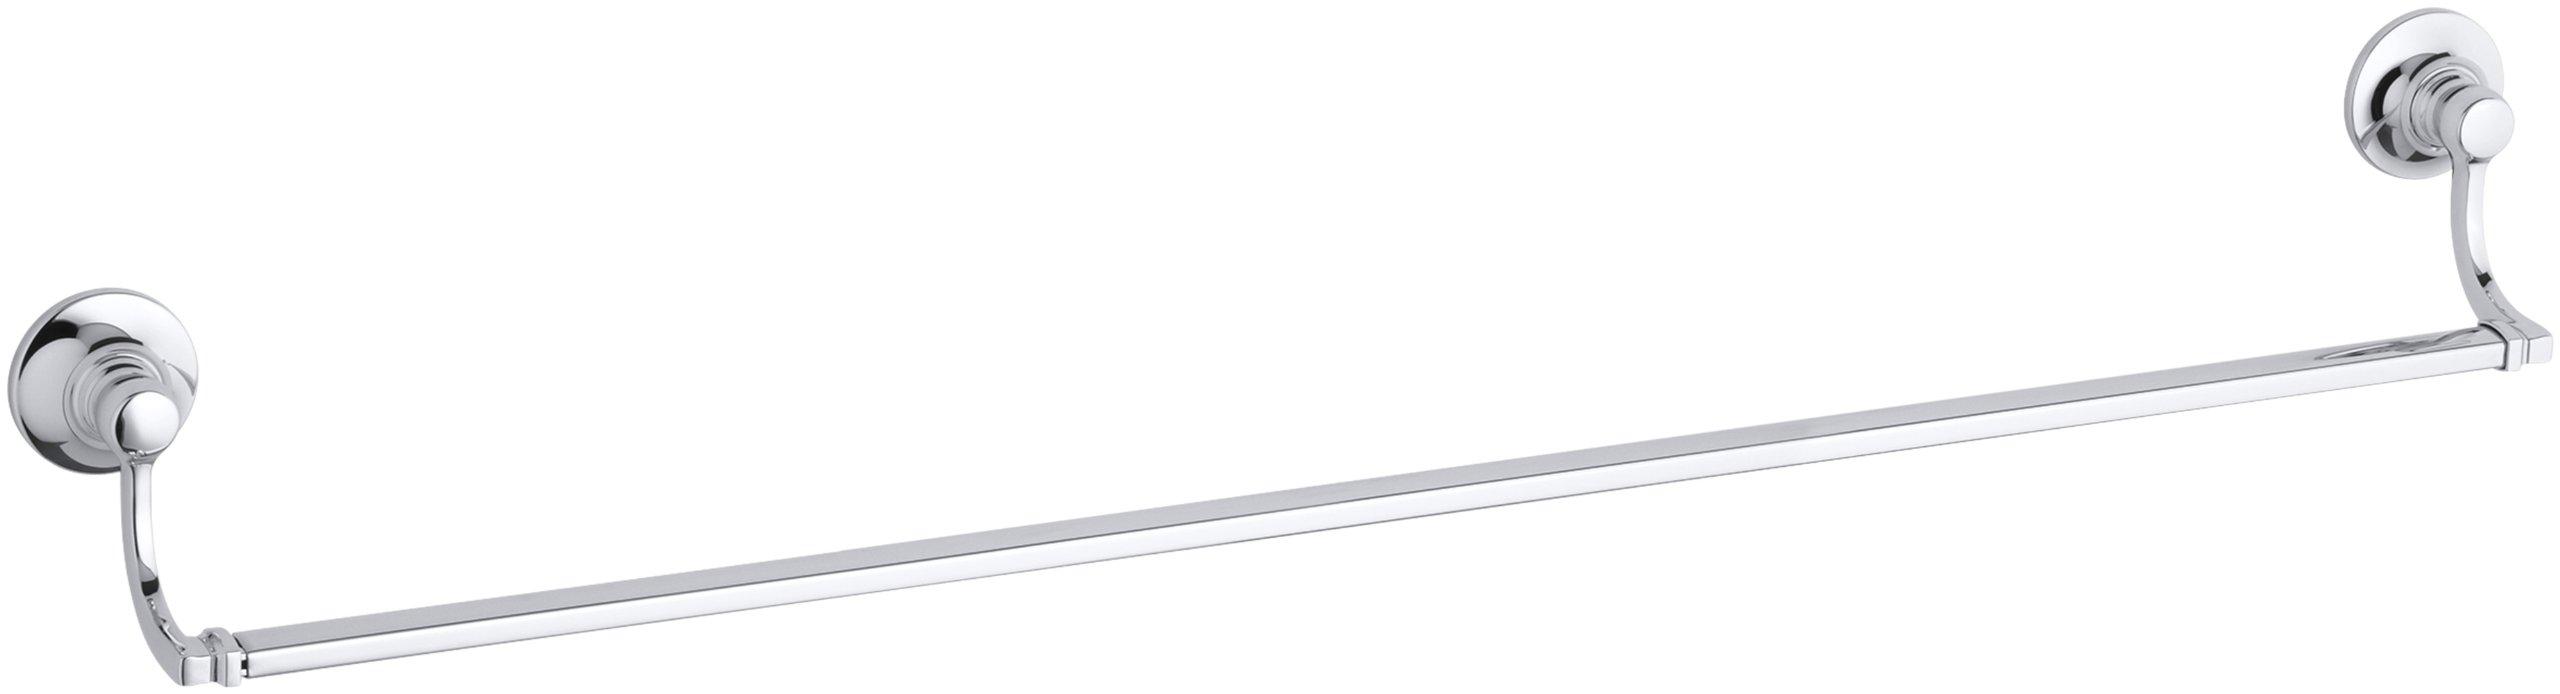 KOHLER K-11412-CP Bancroft 30-Inch Towel Bar, Polished Chrome